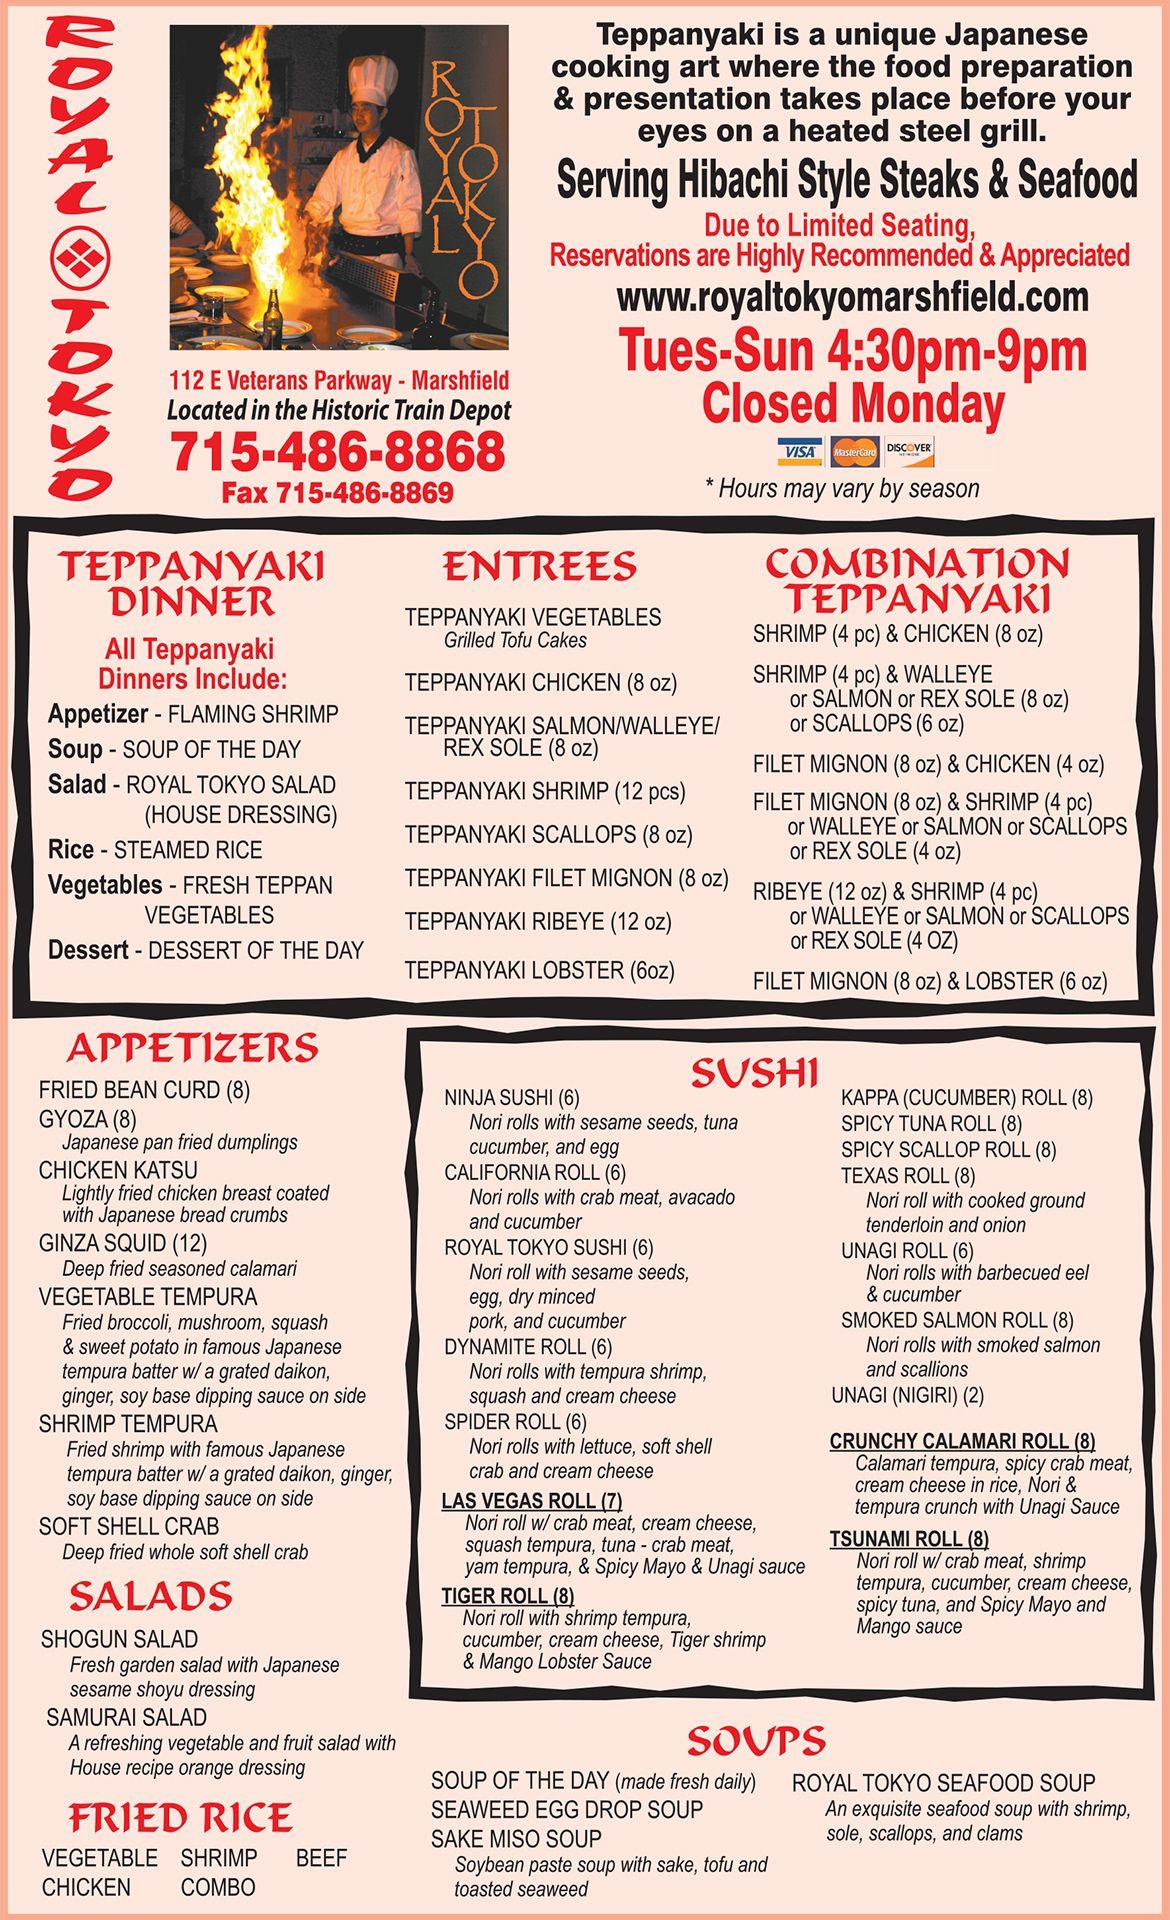 Pin By Mueller Publishing Inc On 2016 17 Restaurant Menus In Central Wi Menu Restaurant Teppanyaki Dining Menu